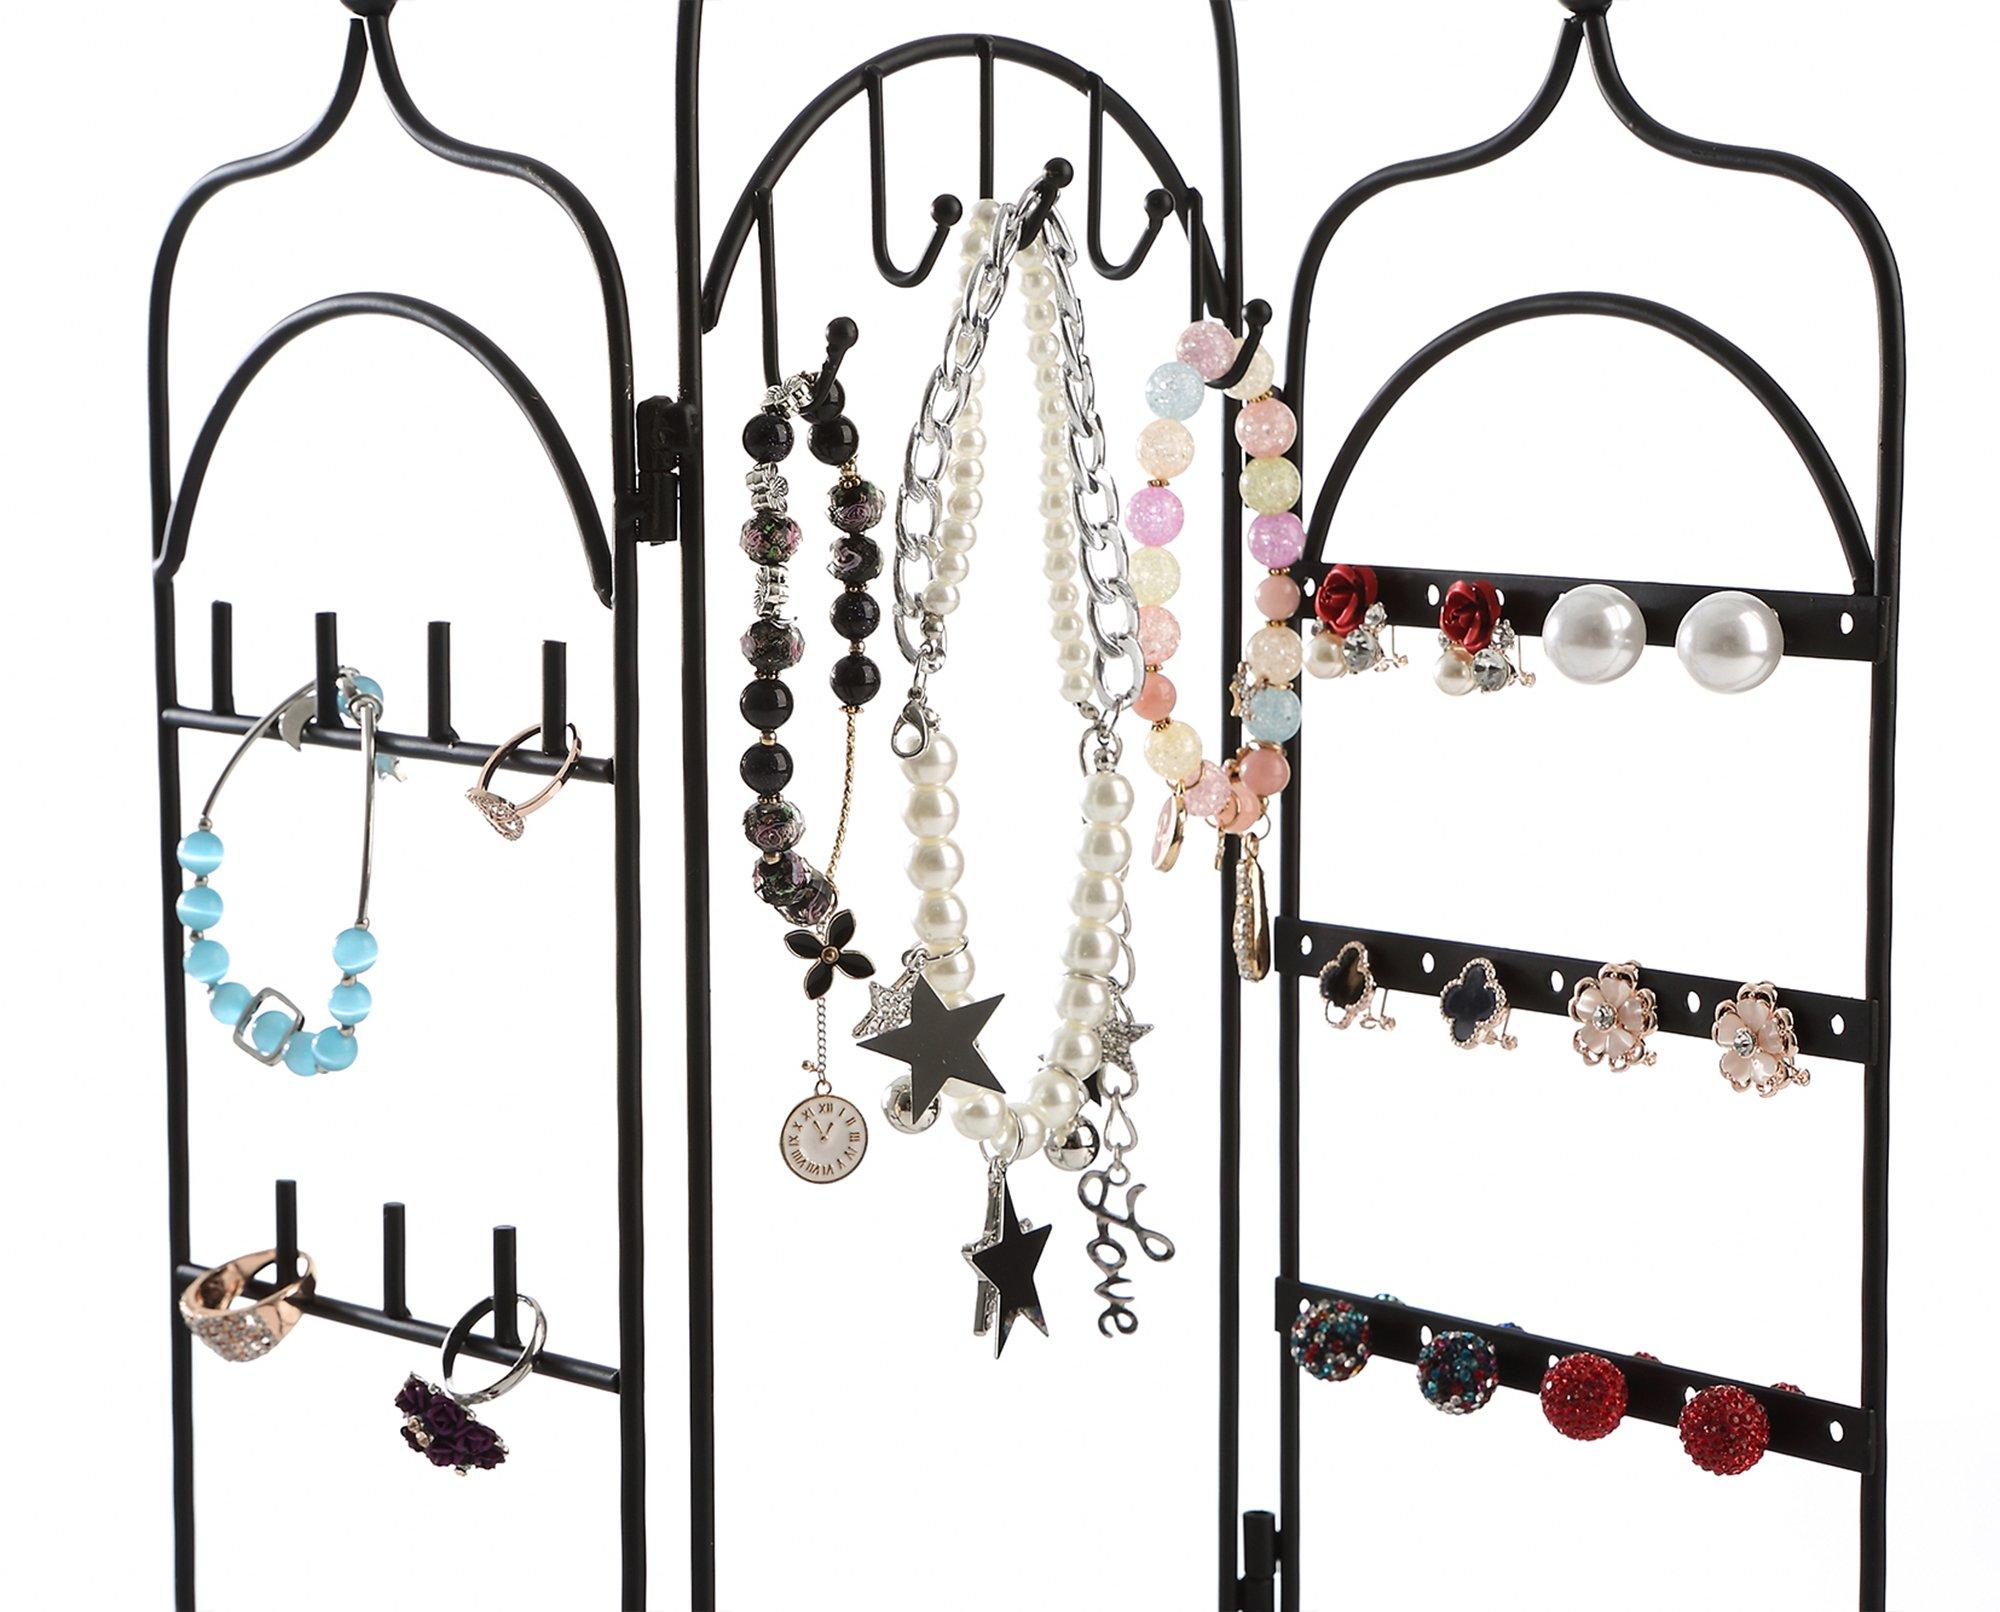 Modern Black Metal 3 Panel Trellis Folding Jewelry Hanger Organizer for Bracelet, Earrings, Necklace